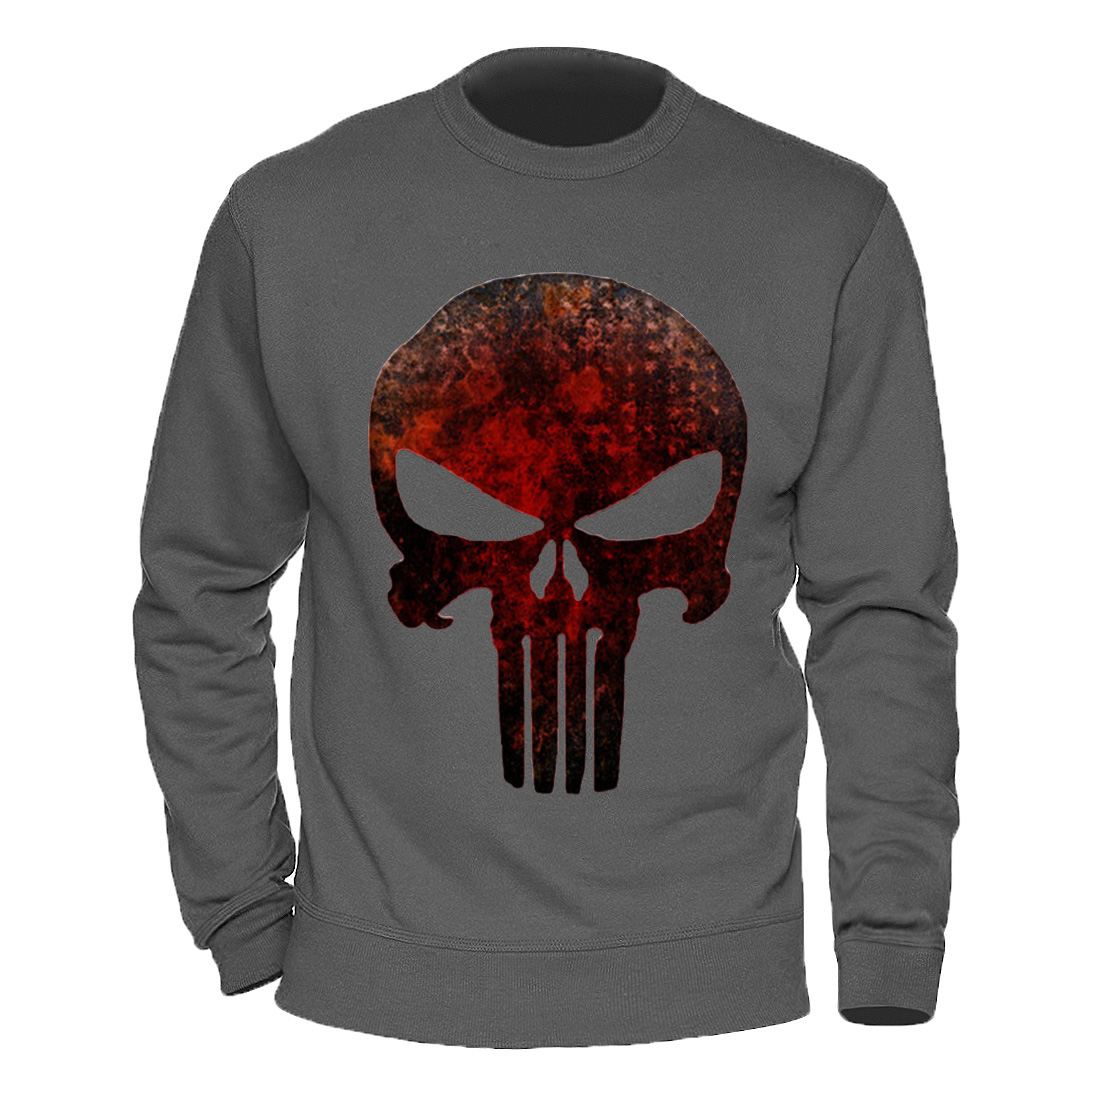 Terror Skull Ghost Sweatshirt Men Punisher Black Summer Long Sleeve Hoodies Tops Printing Casual Cotton Male Clothing